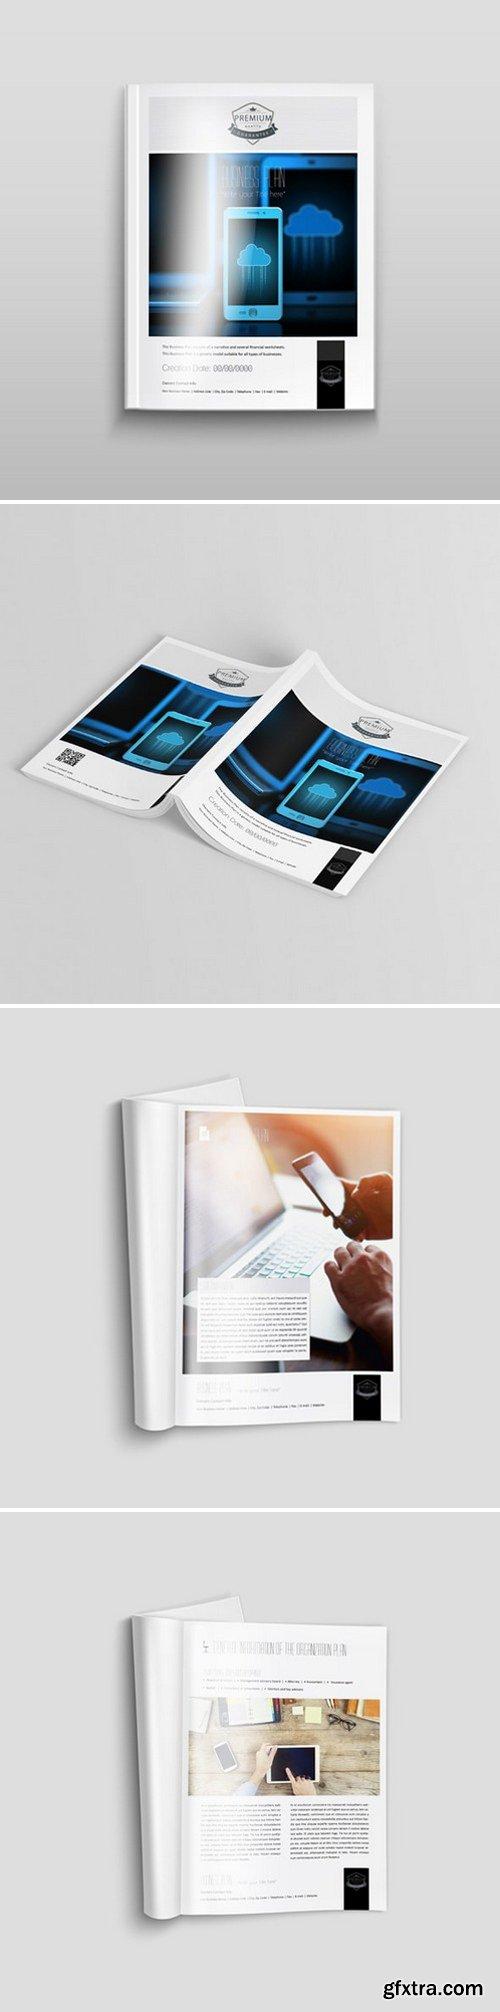 KeBoto - A4 Portrait Business Plan Template 000172